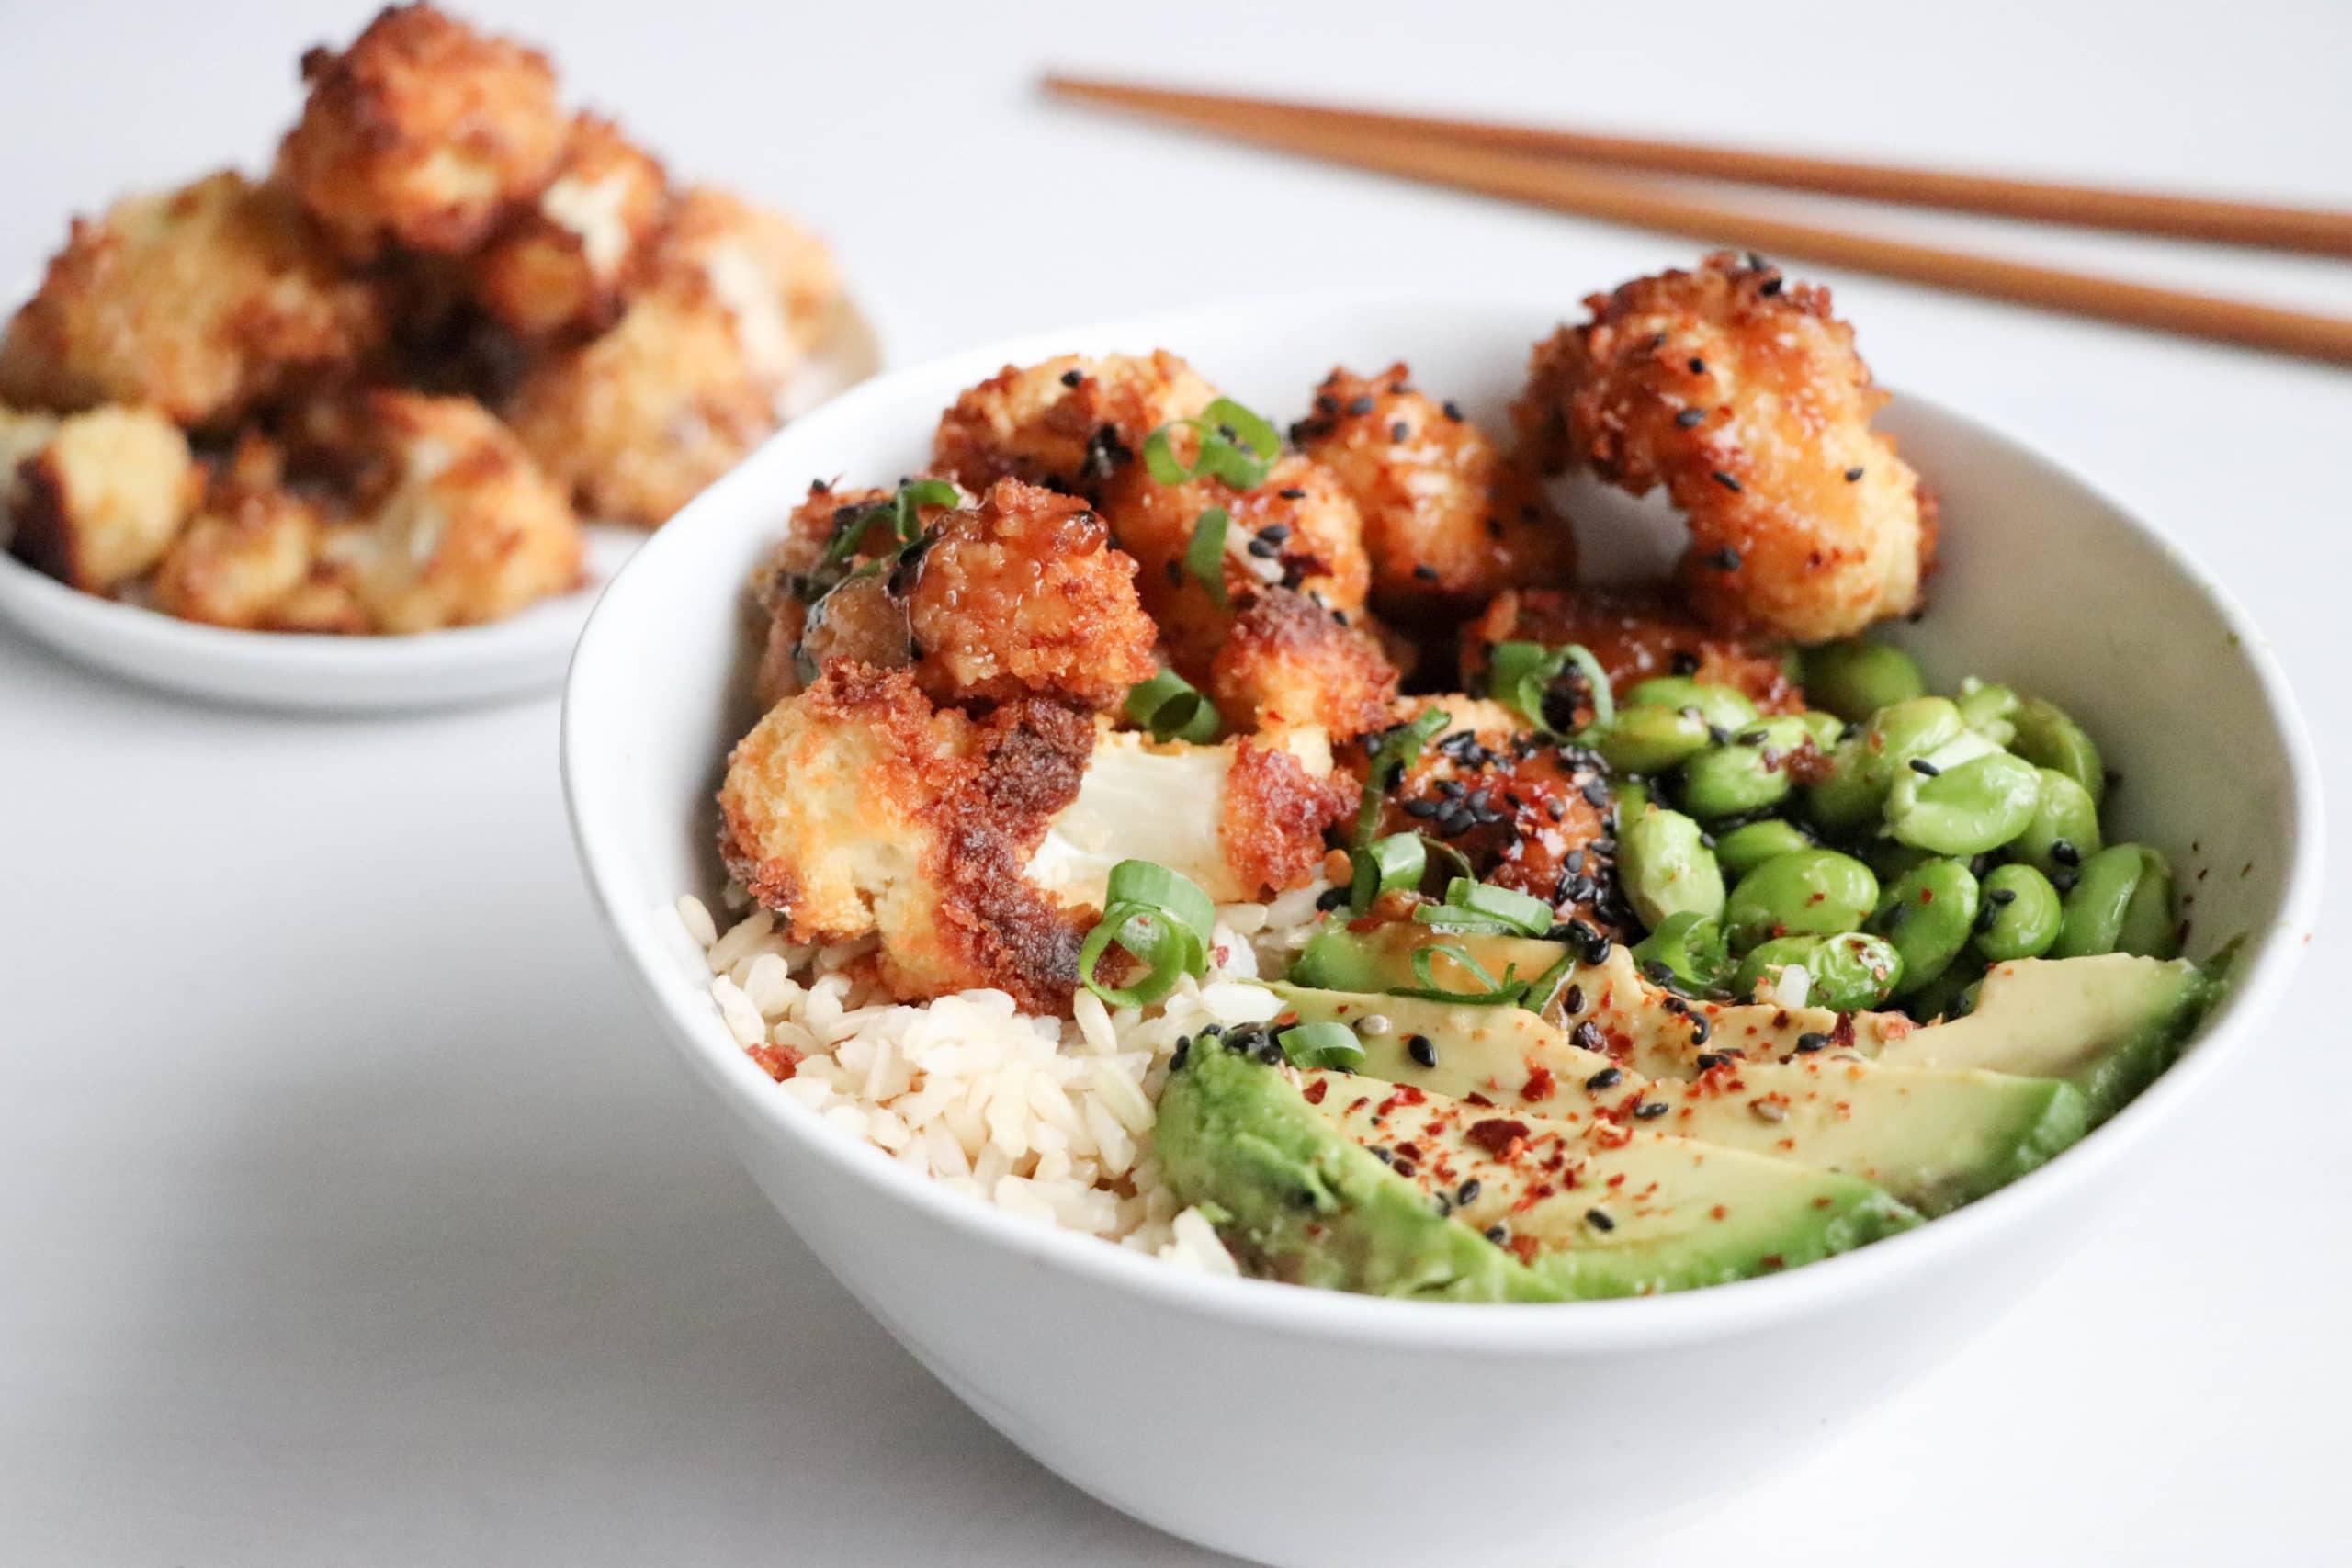 Crispy baked cauliflower in a white bowl over a white surface with a plate of crispy cauliflower beside it. Ingredients include: rice, avocado, edamame, crispy cauliflower.